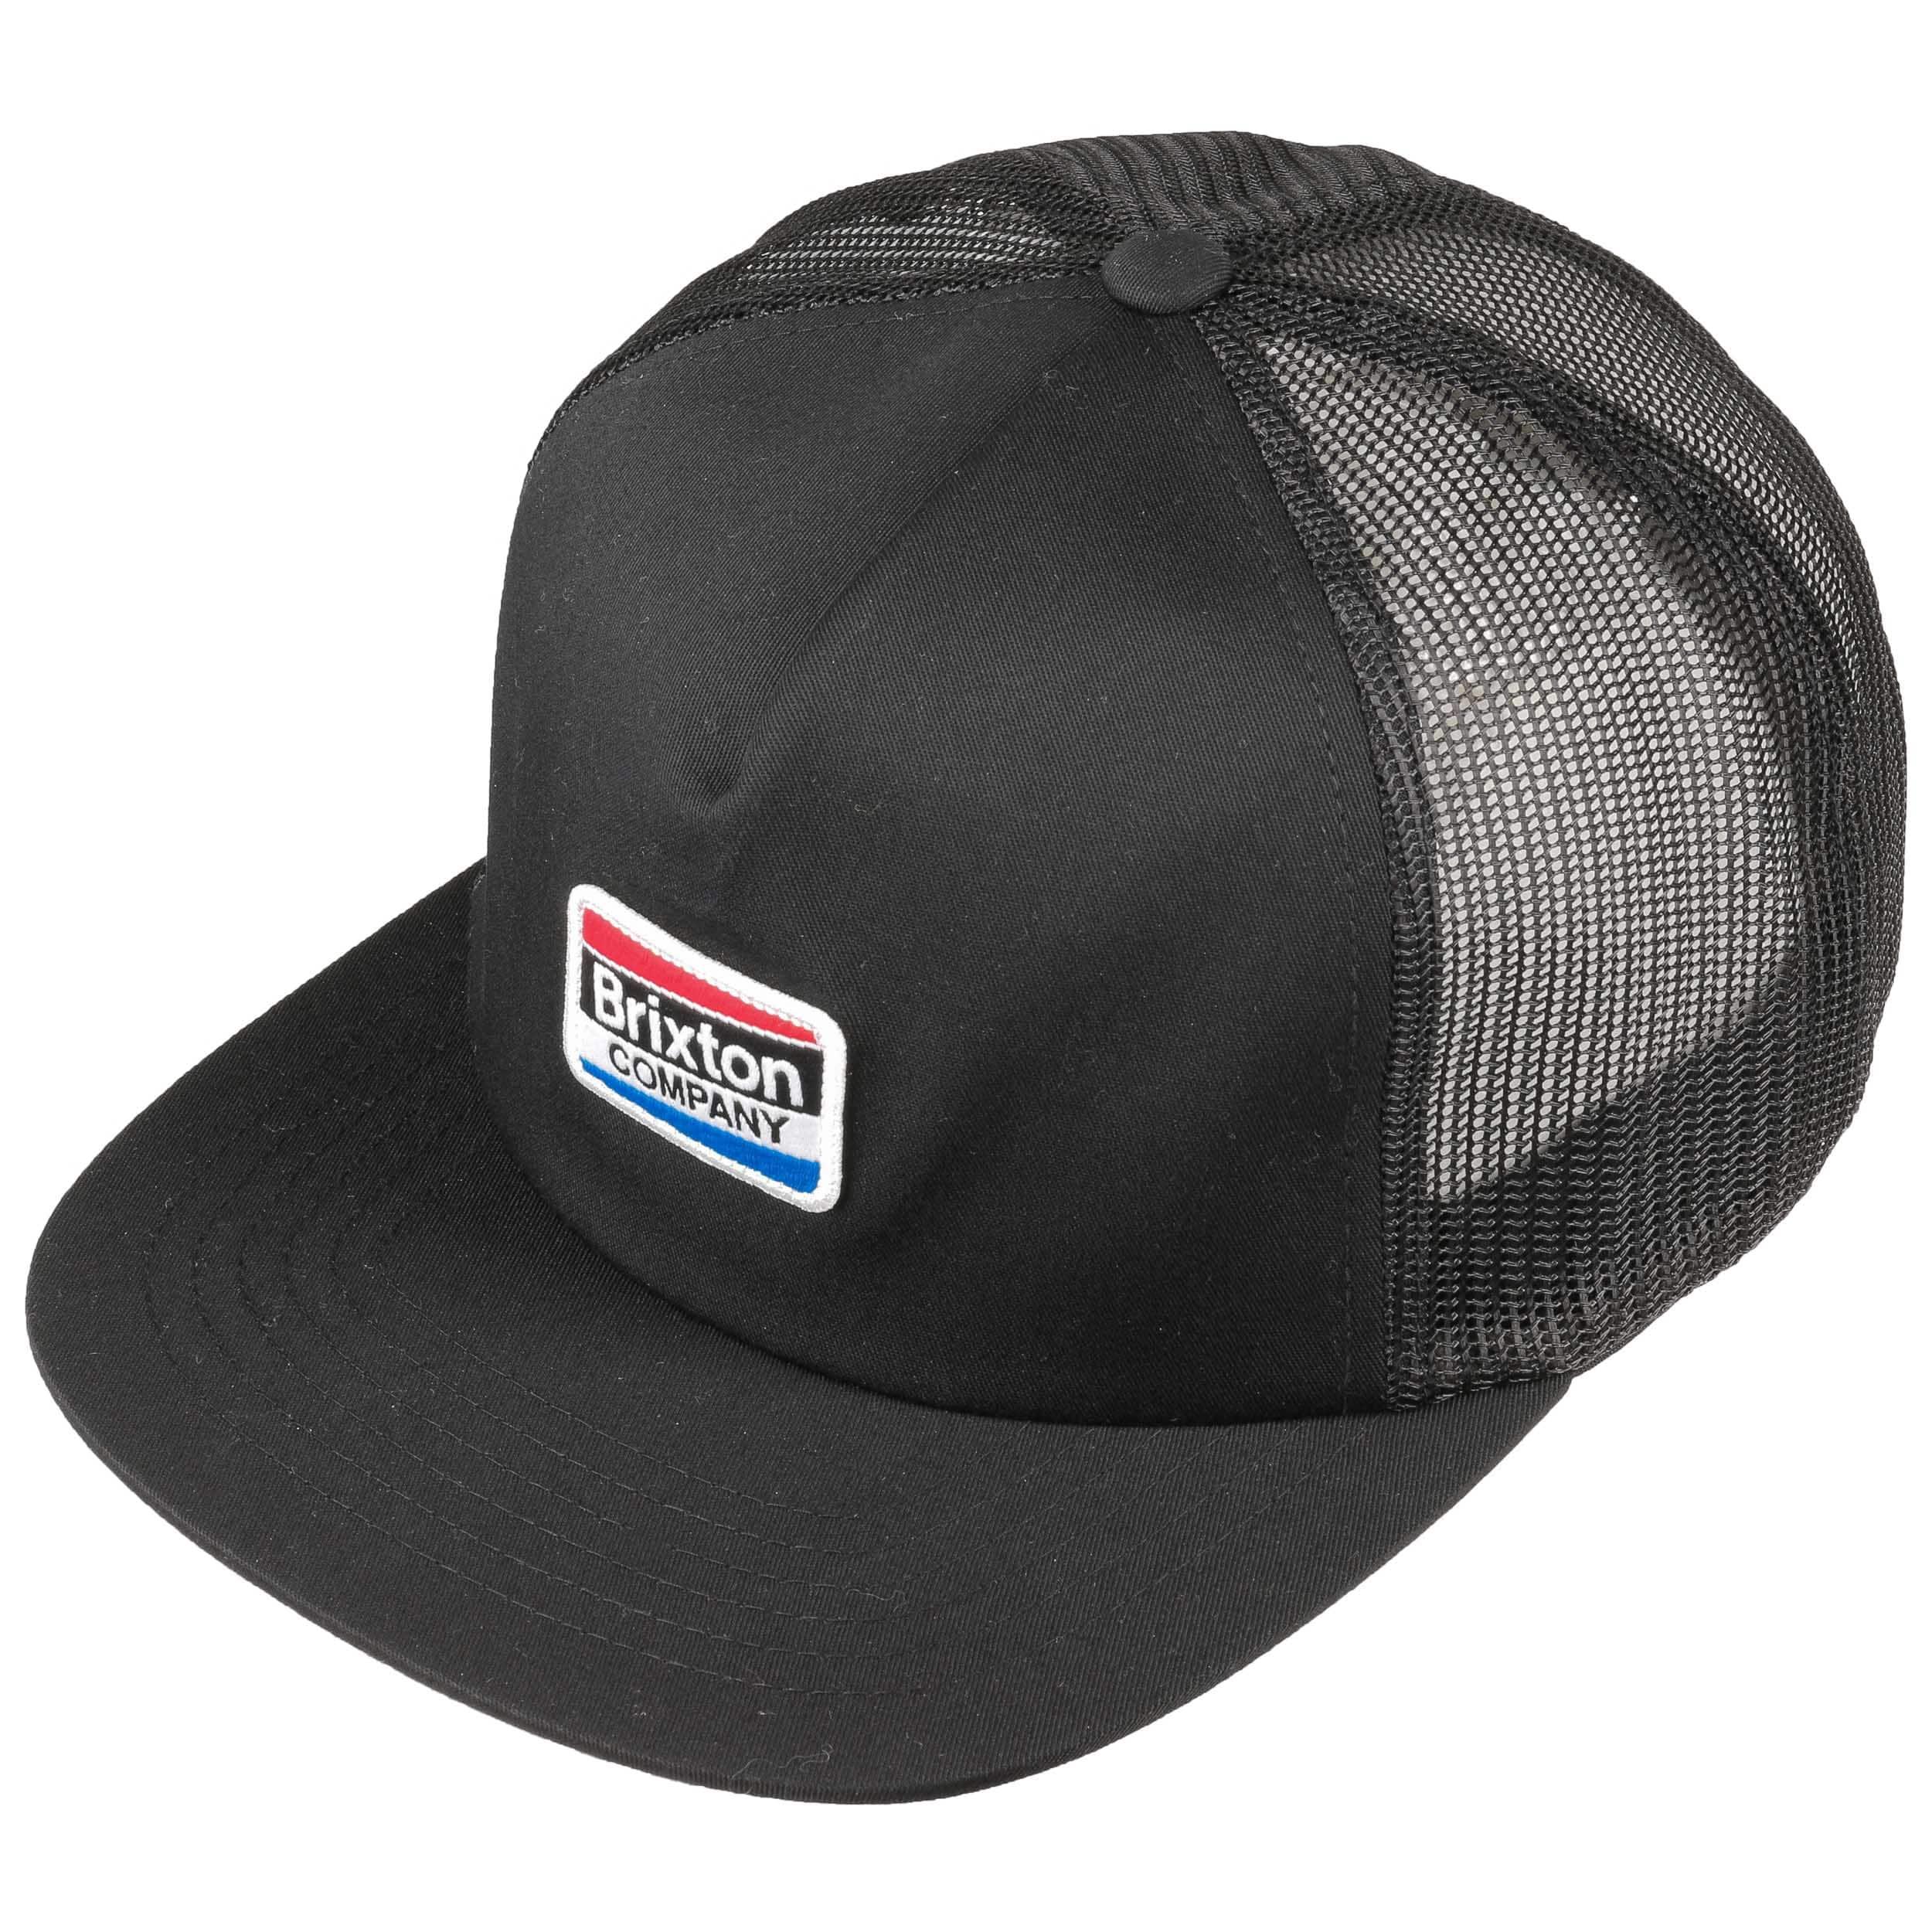 ... Worden Mesh Trucker Cap by Brixton - black 1 ... 824f298b8219